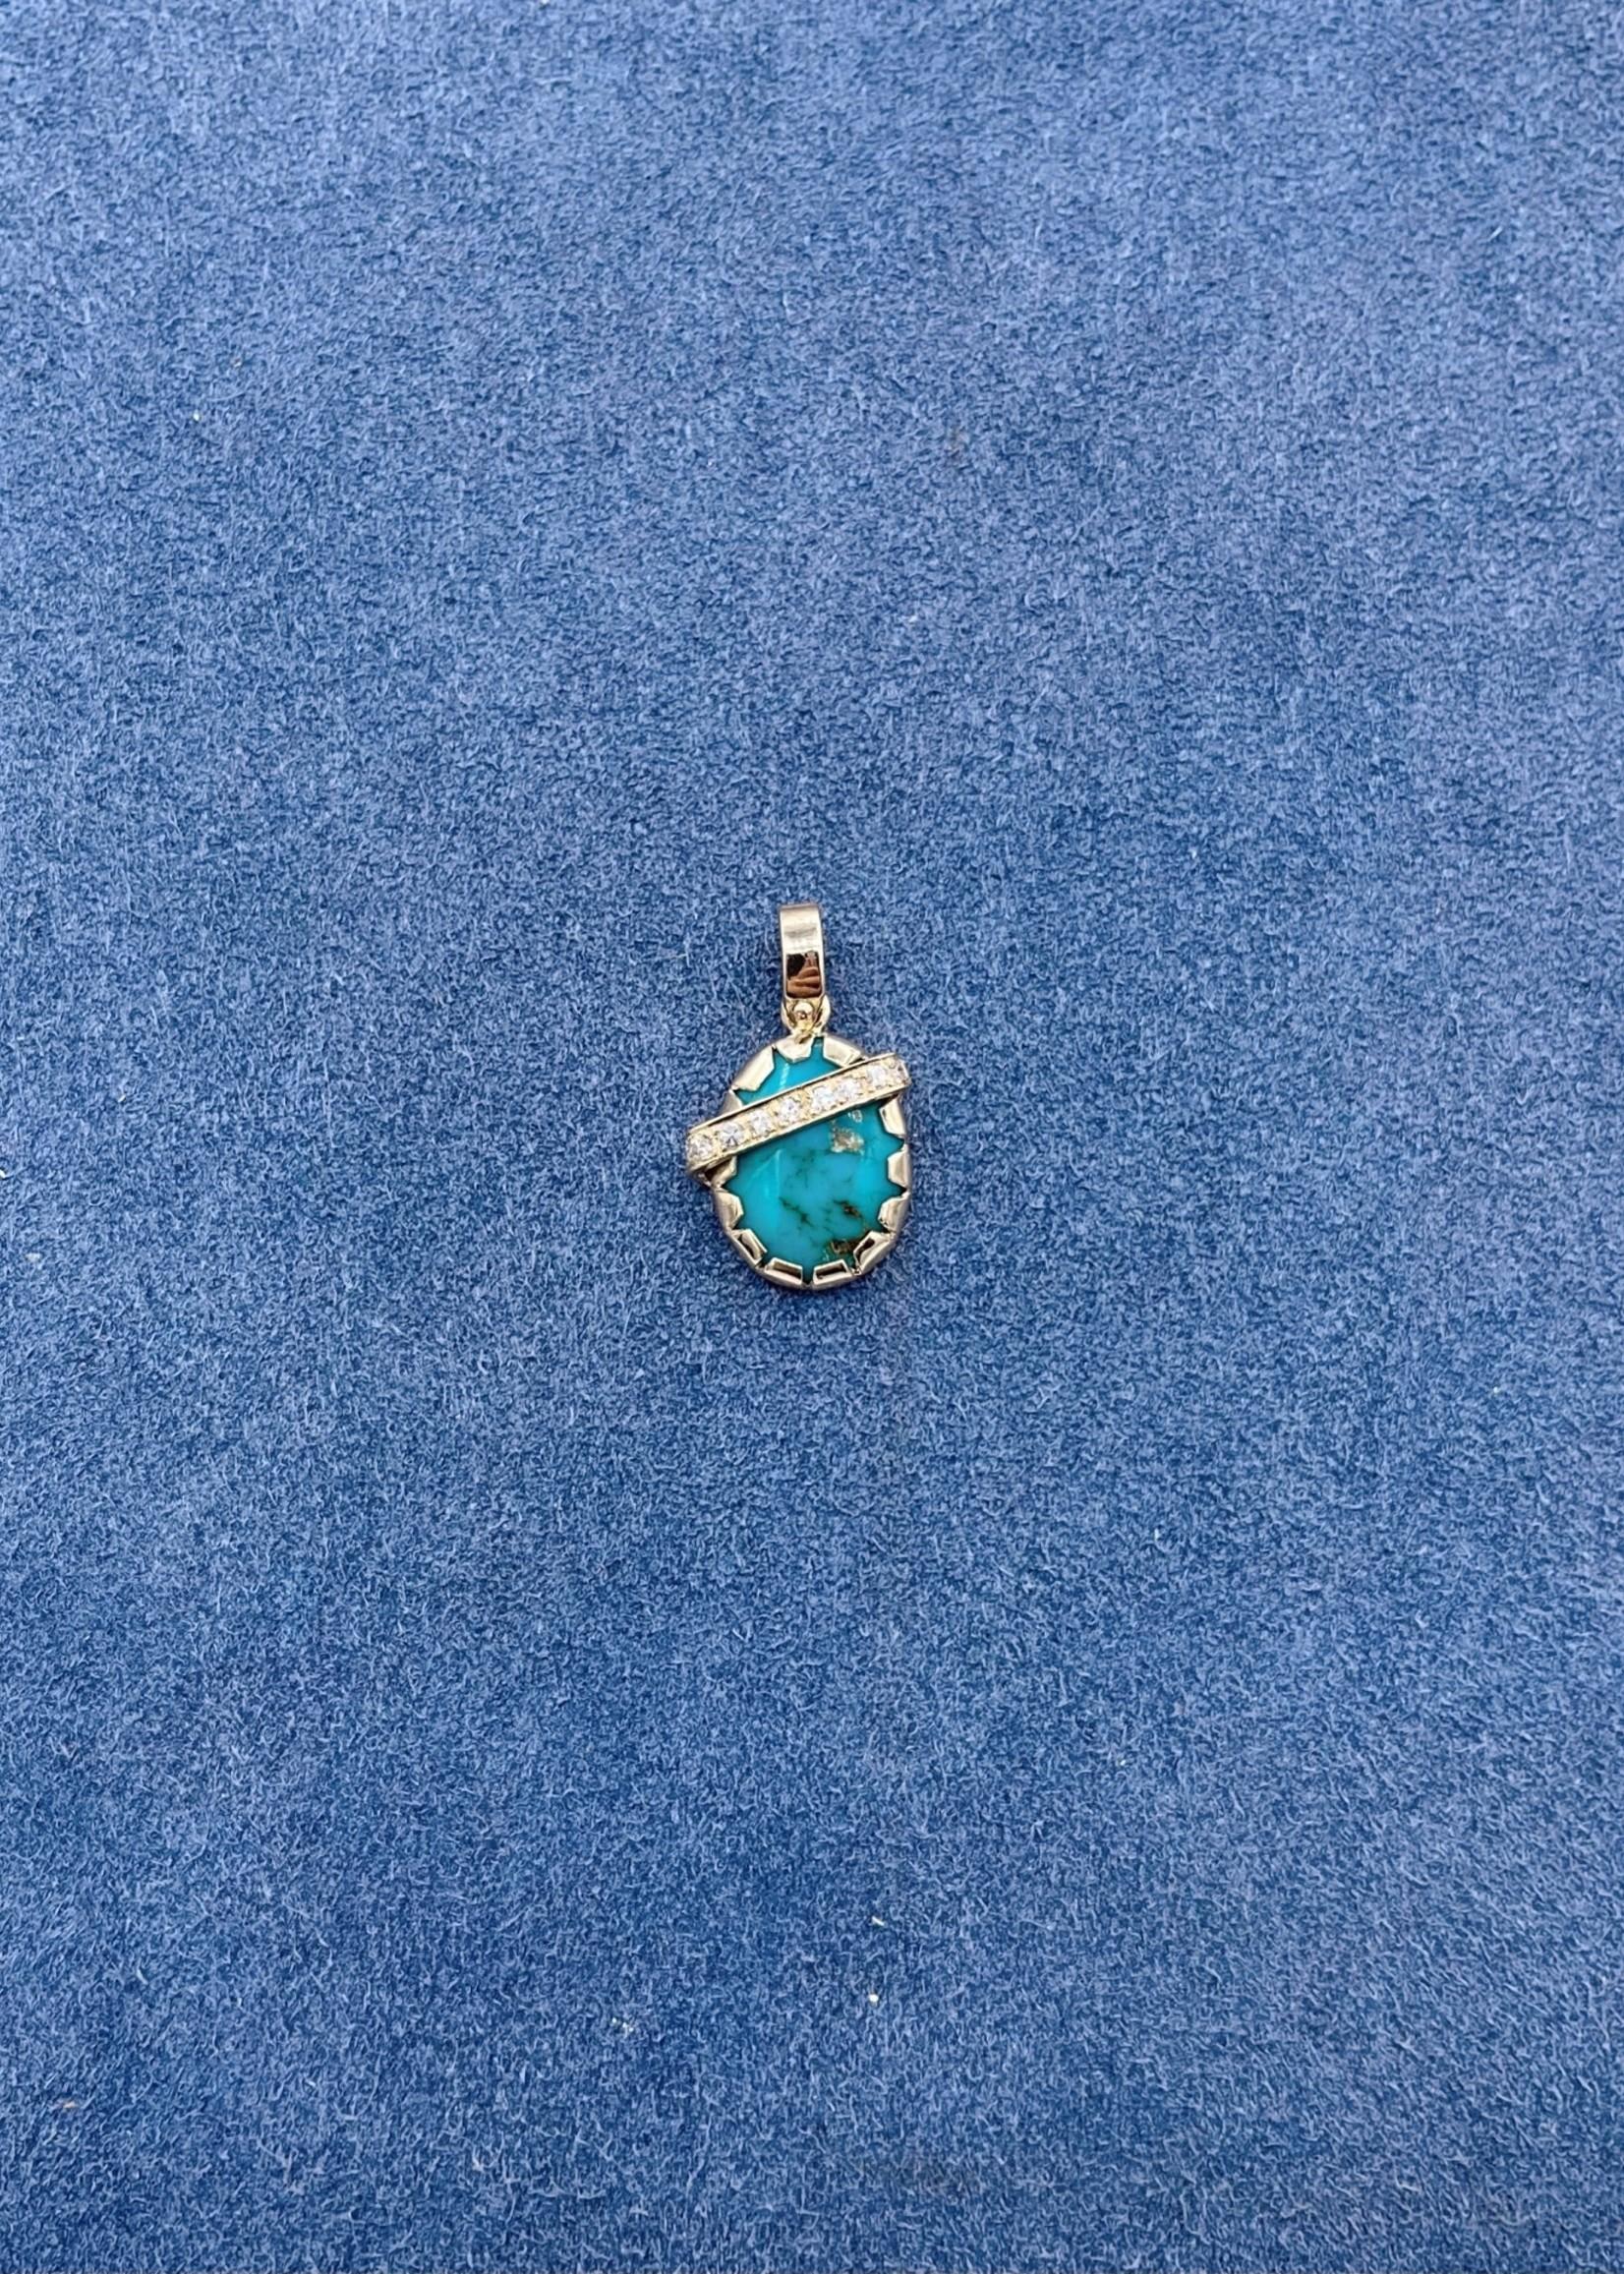 CJ Designs Turquoise Diamond Pendant 14k Yellow